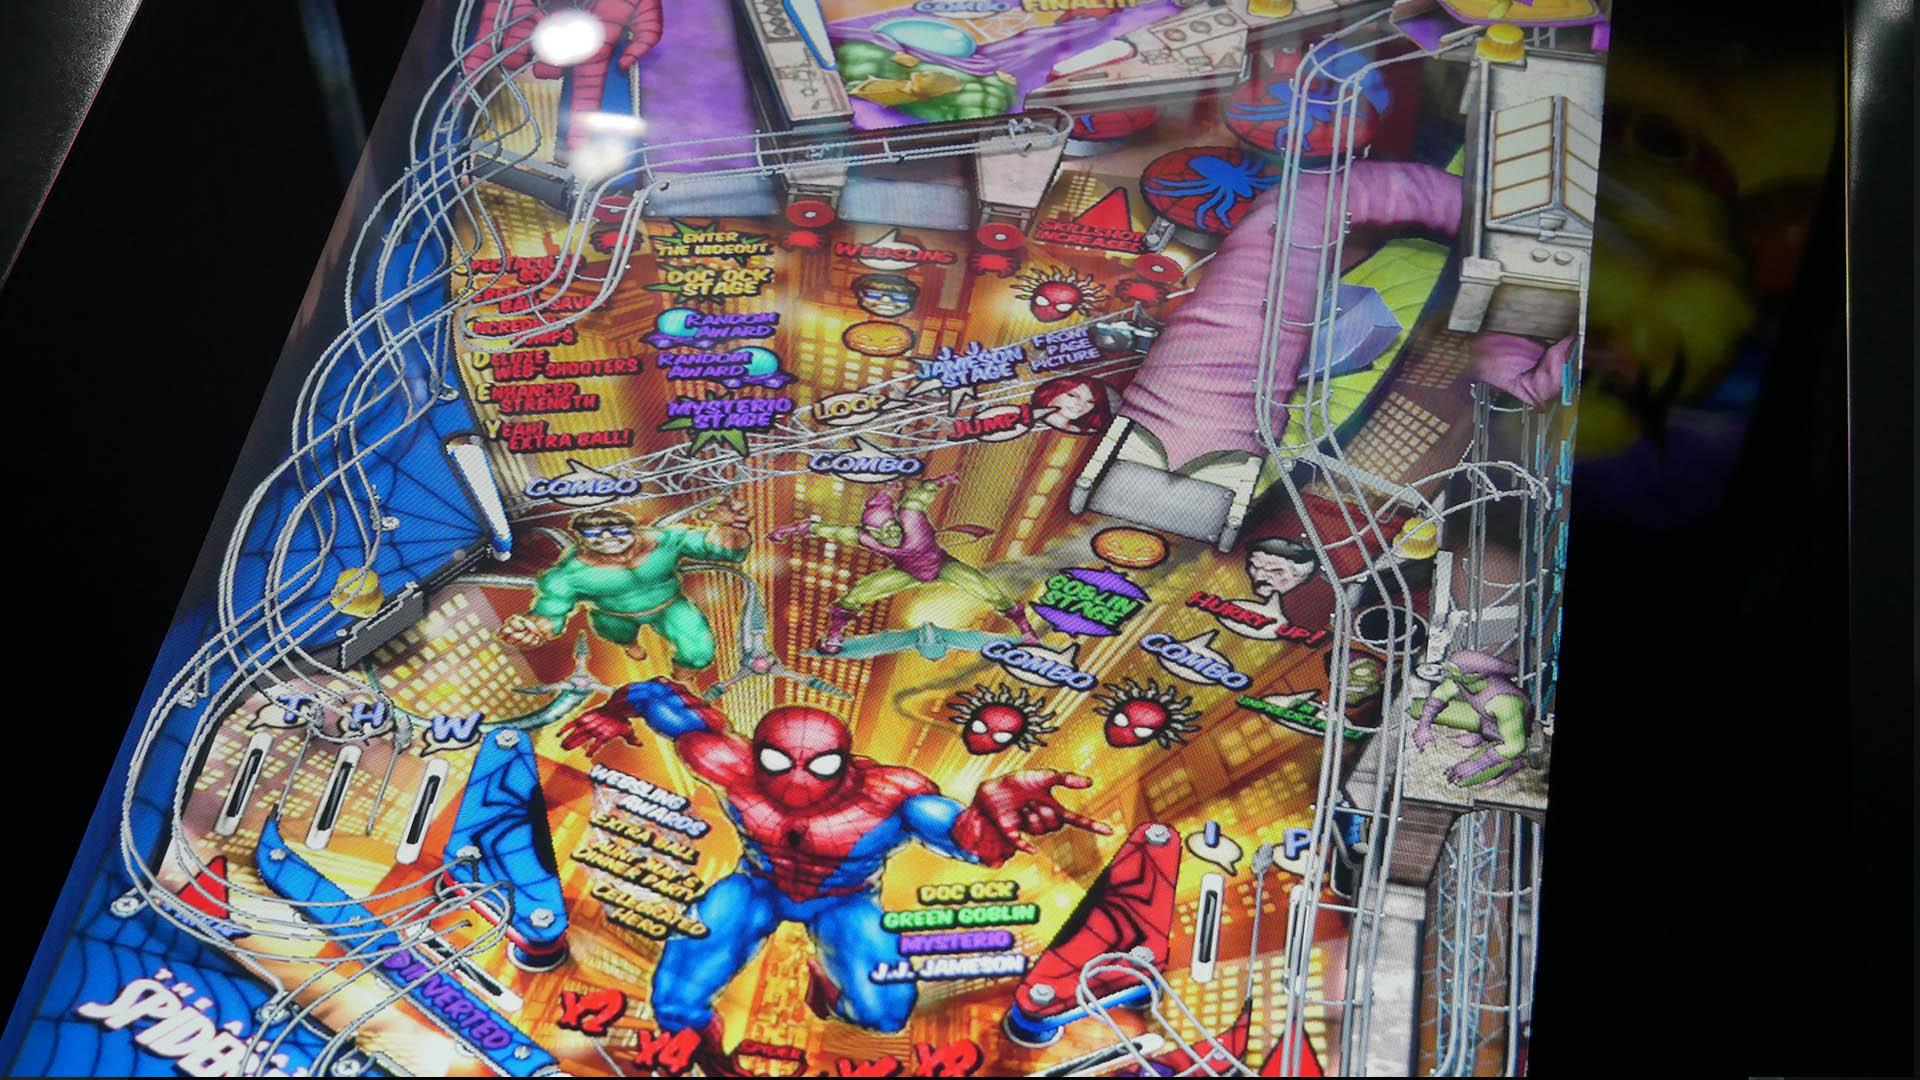 Image of Arcade1Up Pinball game